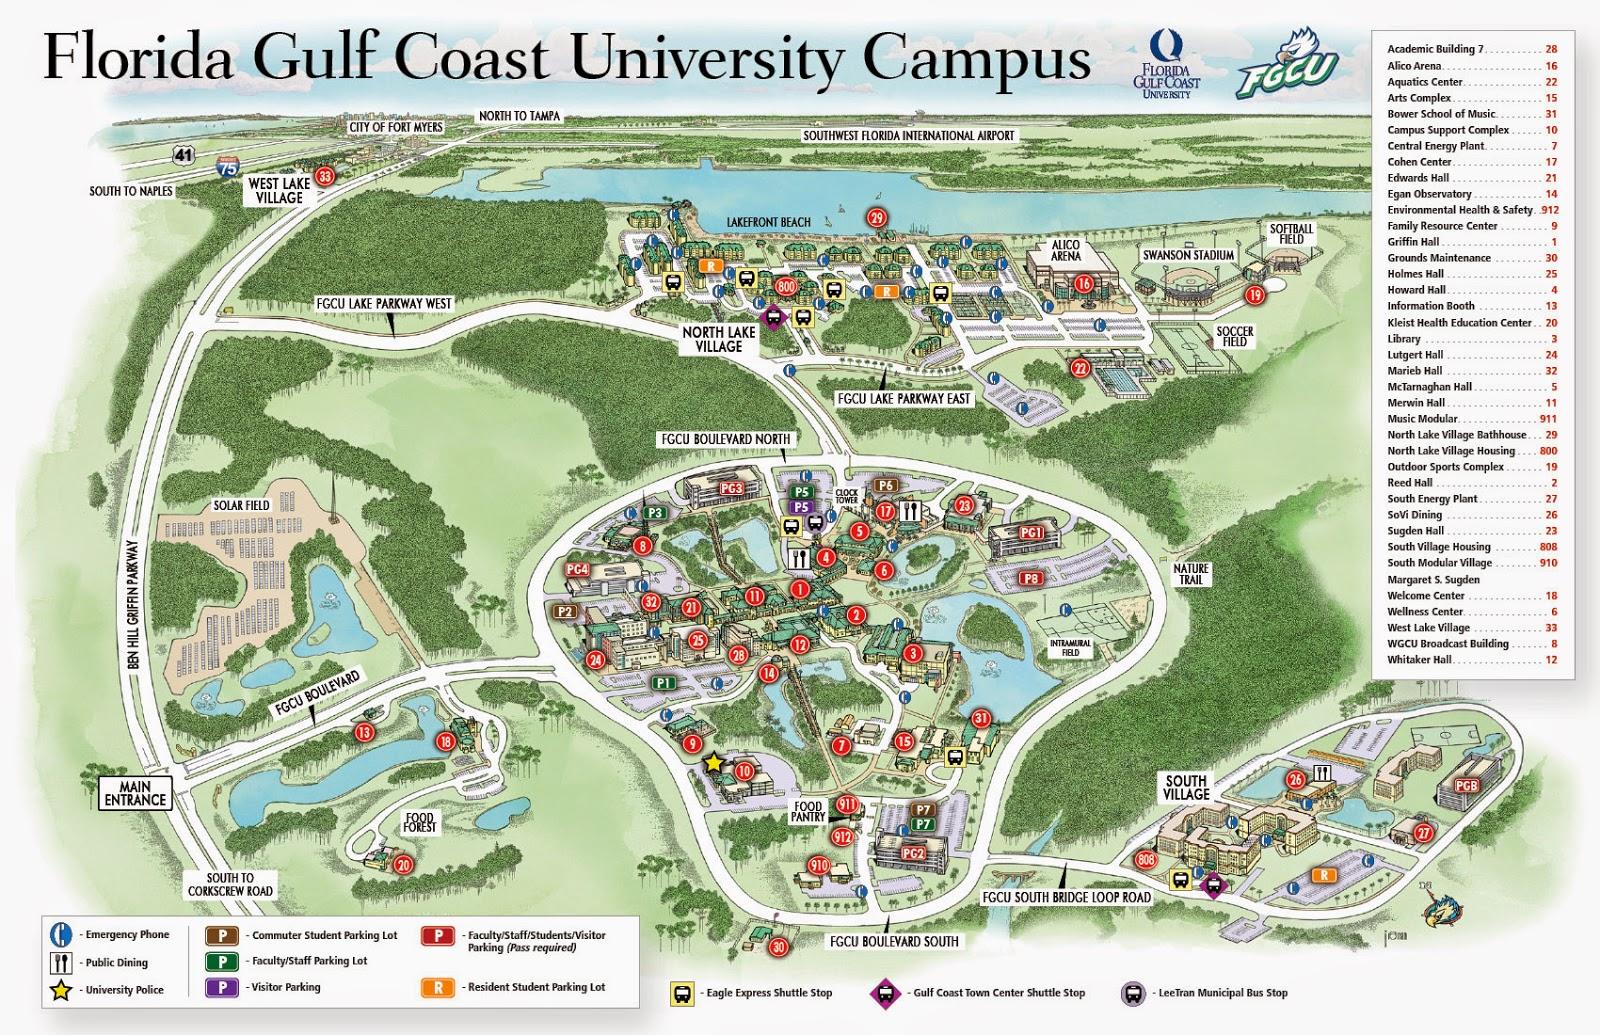 http www fgcu edu admissions images pictoralcampusmap2012 jpg